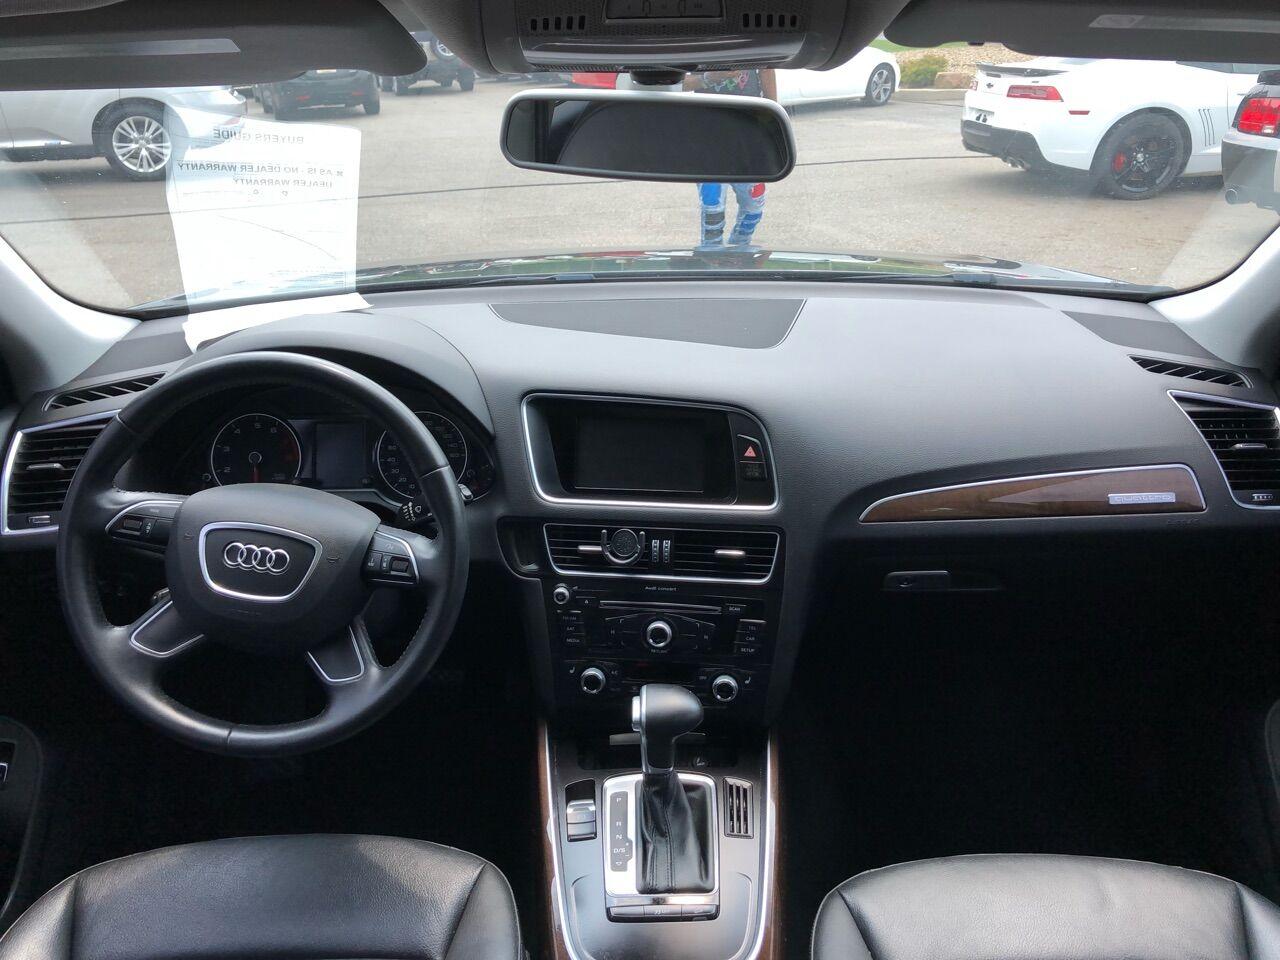 2016 Audi Q5 Sport Utility